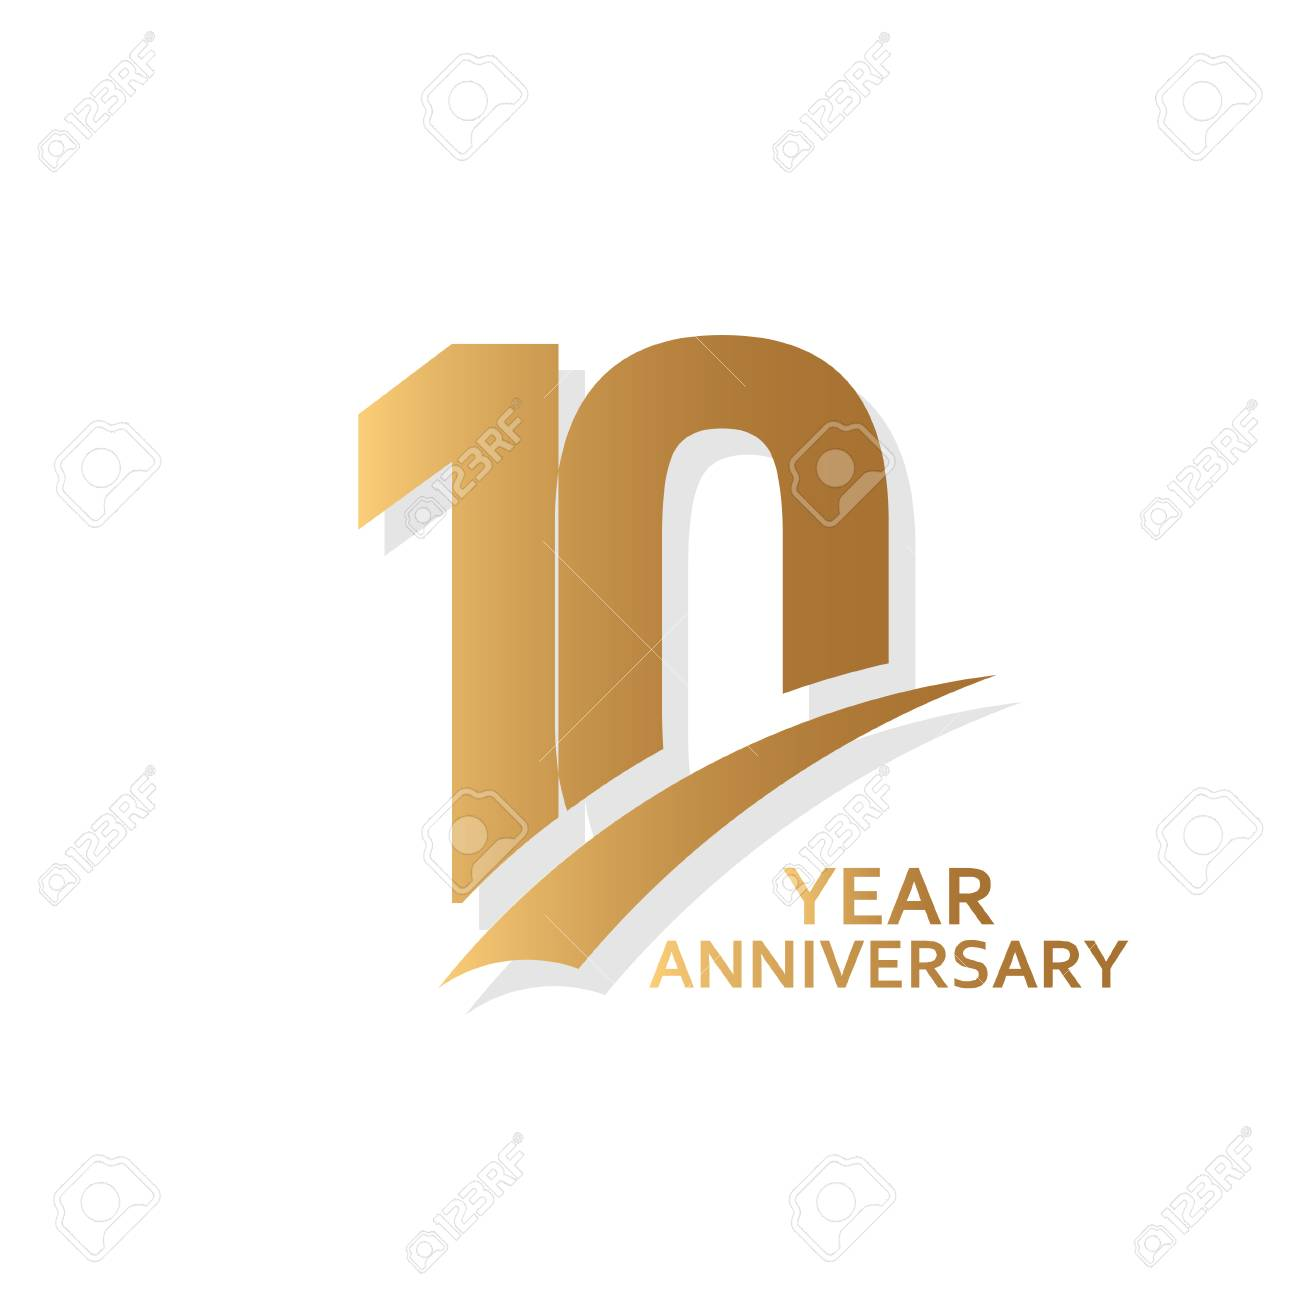 10 Year Anniversary Vector Template Design Illustration - 118887865